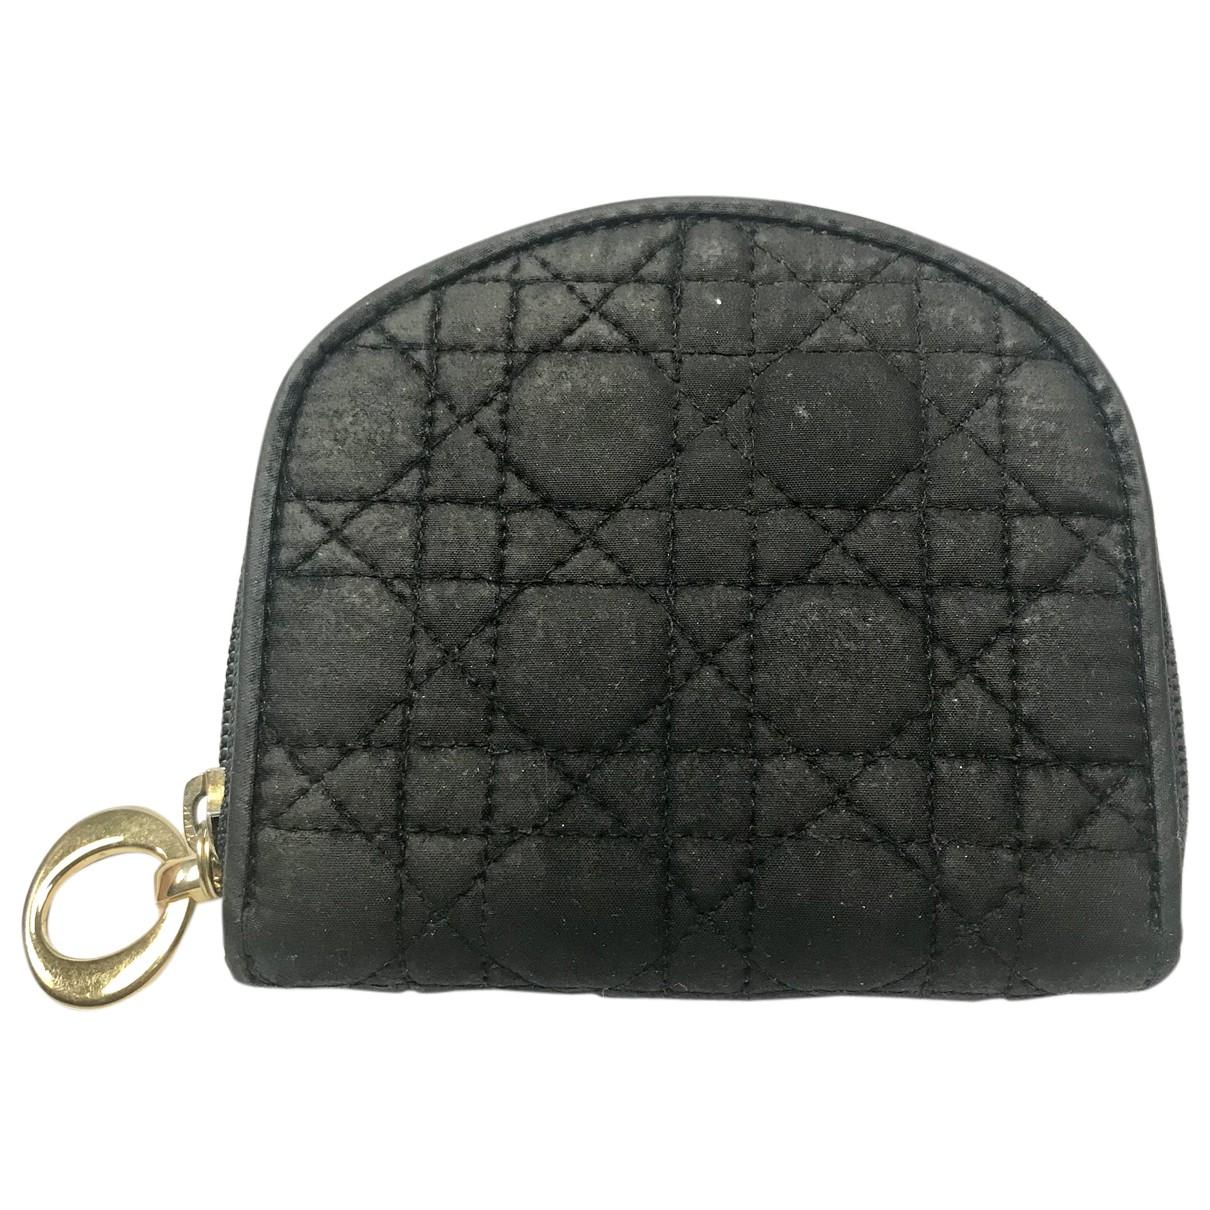 Dior N Black Cloth Purses, wallet & cases for Women N